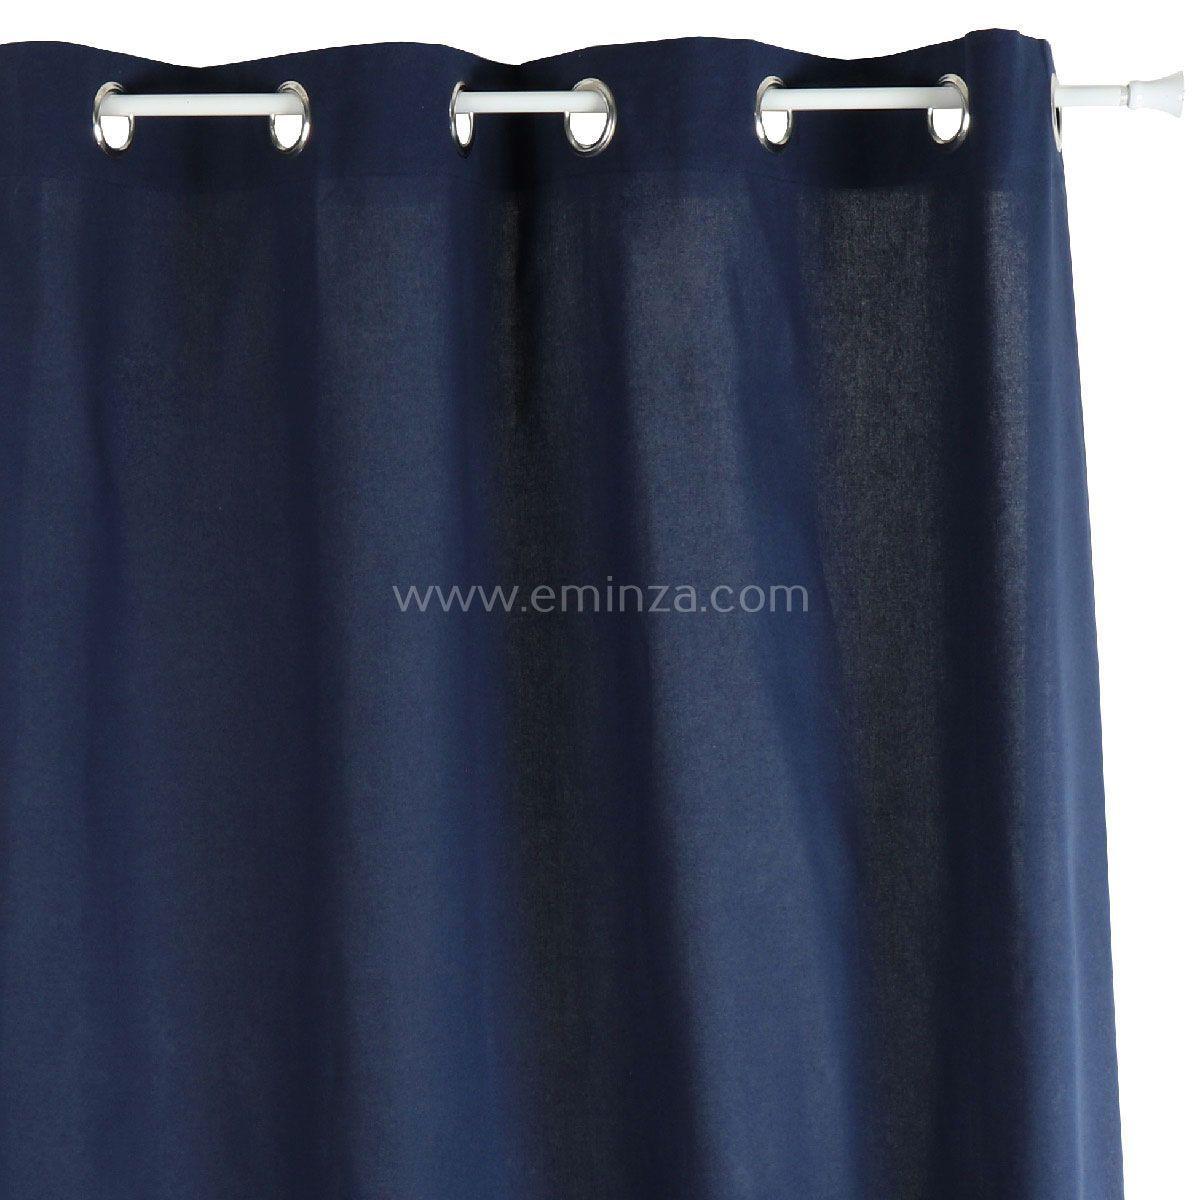 rideau tamisant 140 cm x h240 etna bleu marine rideau tamisant eminza. Black Bedroom Furniture Sets. Home Design Ideas